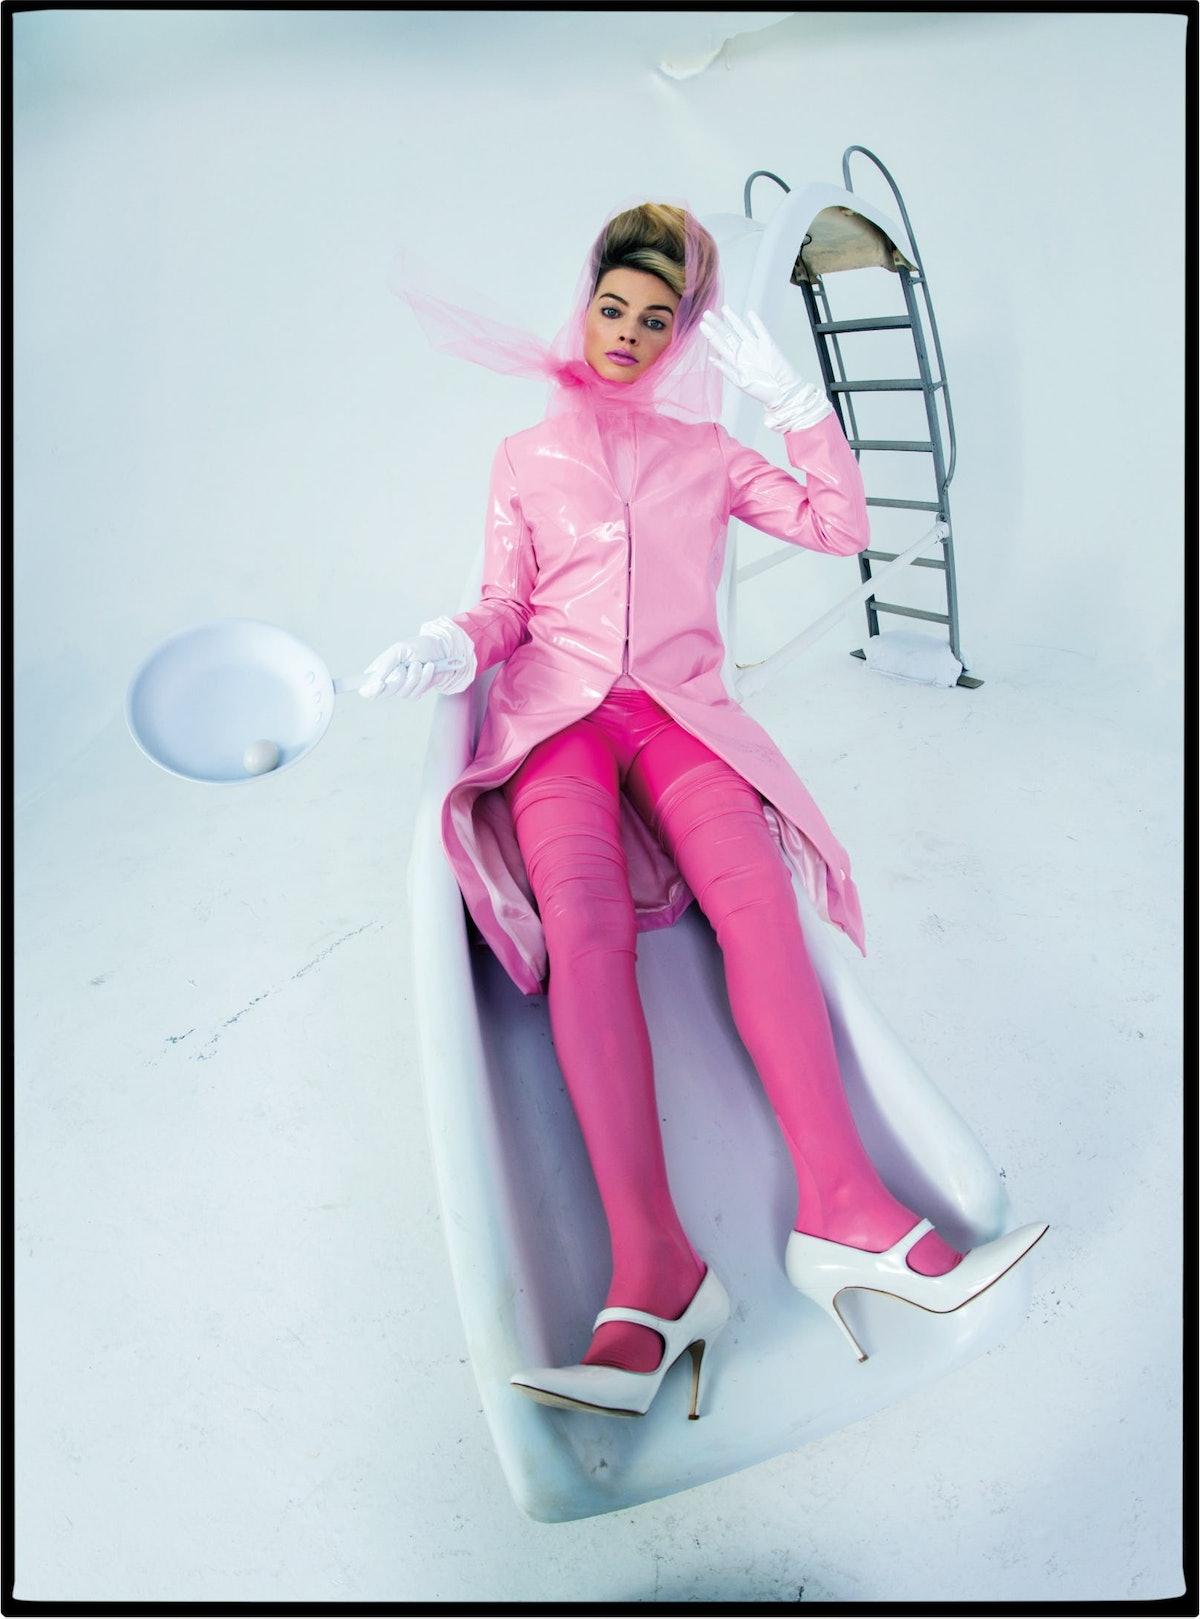 Margot Robbie in a pink coat.